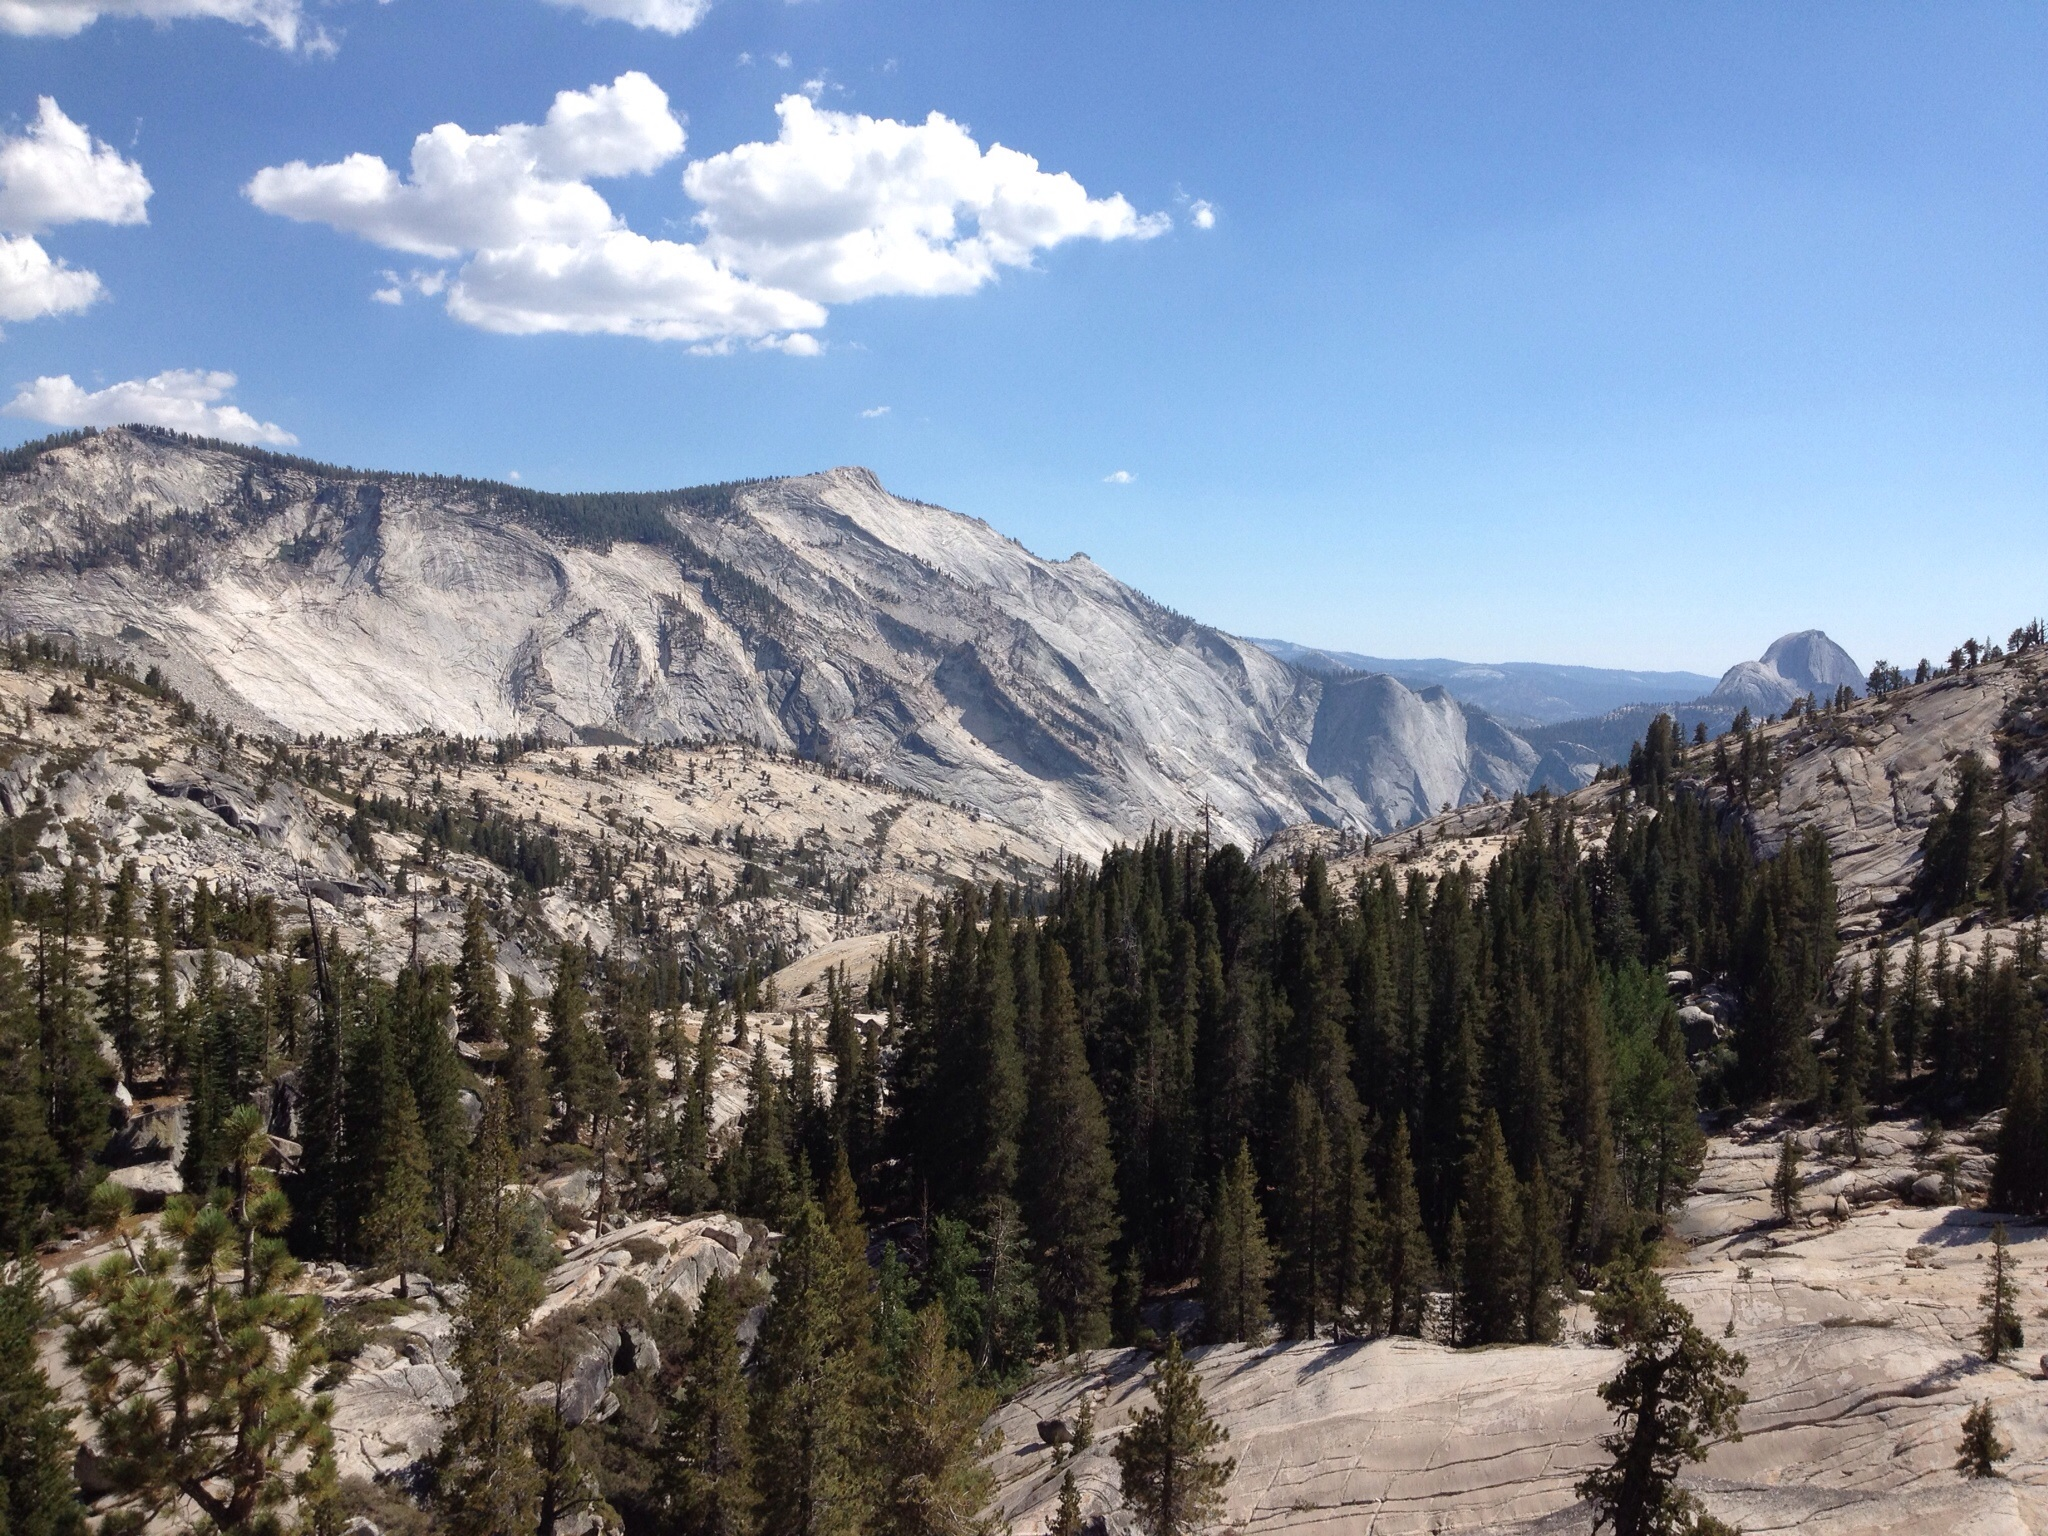 You should definitely come to Yosemite